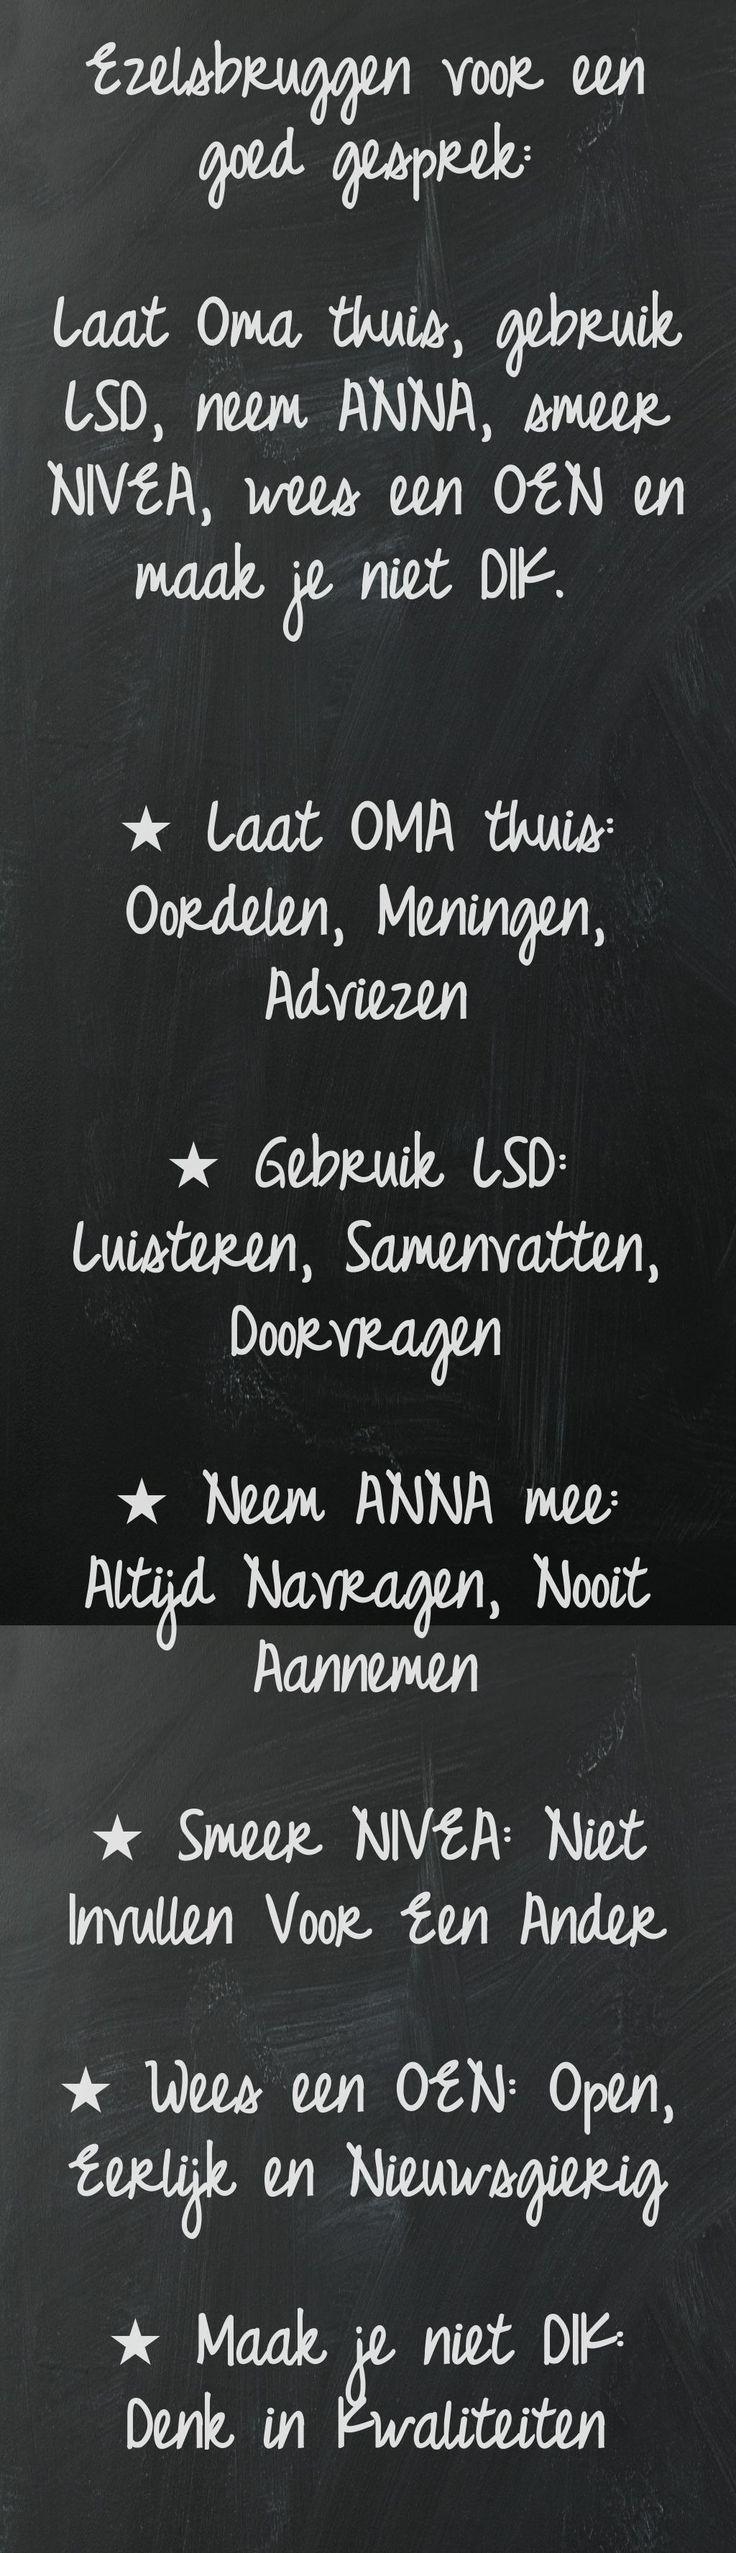 Een goed gesprek: OMA, NIVEA, LSD, ANNA, OEN en DIK!